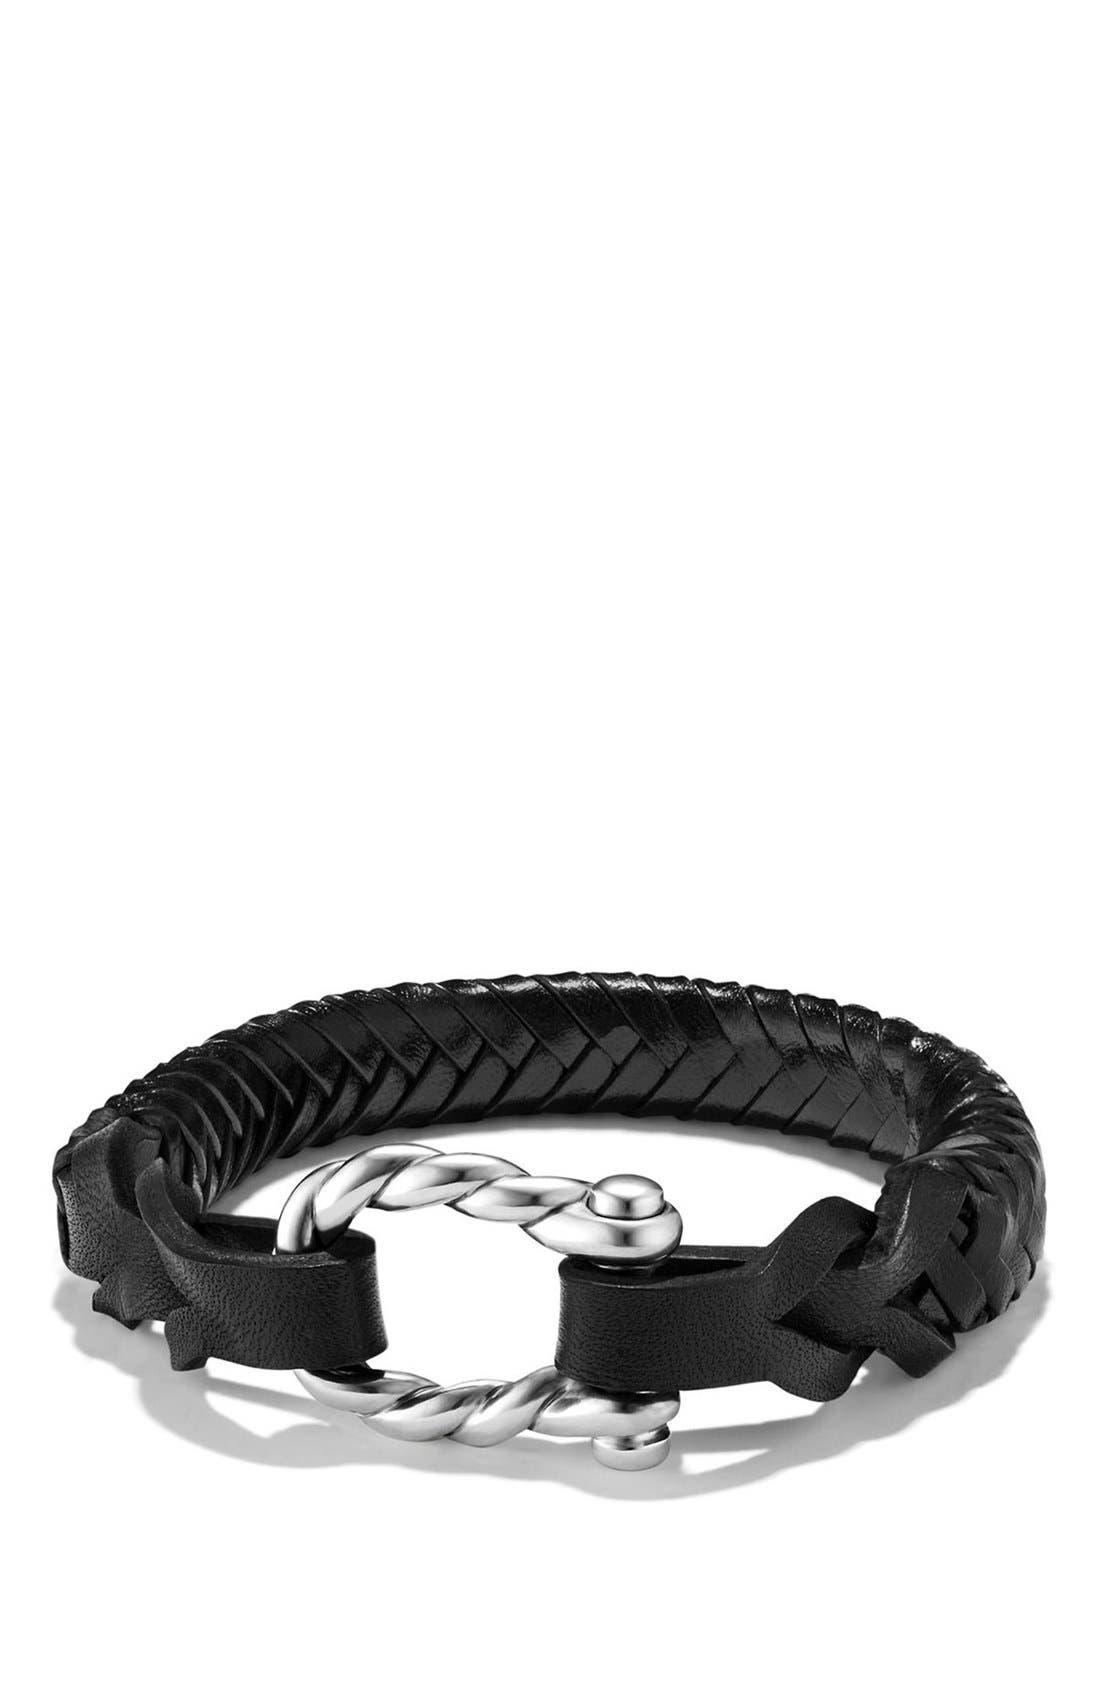 'Maritime' Leather Woven Shackle Bracelet,                         Main,                         color, Silver/ Black